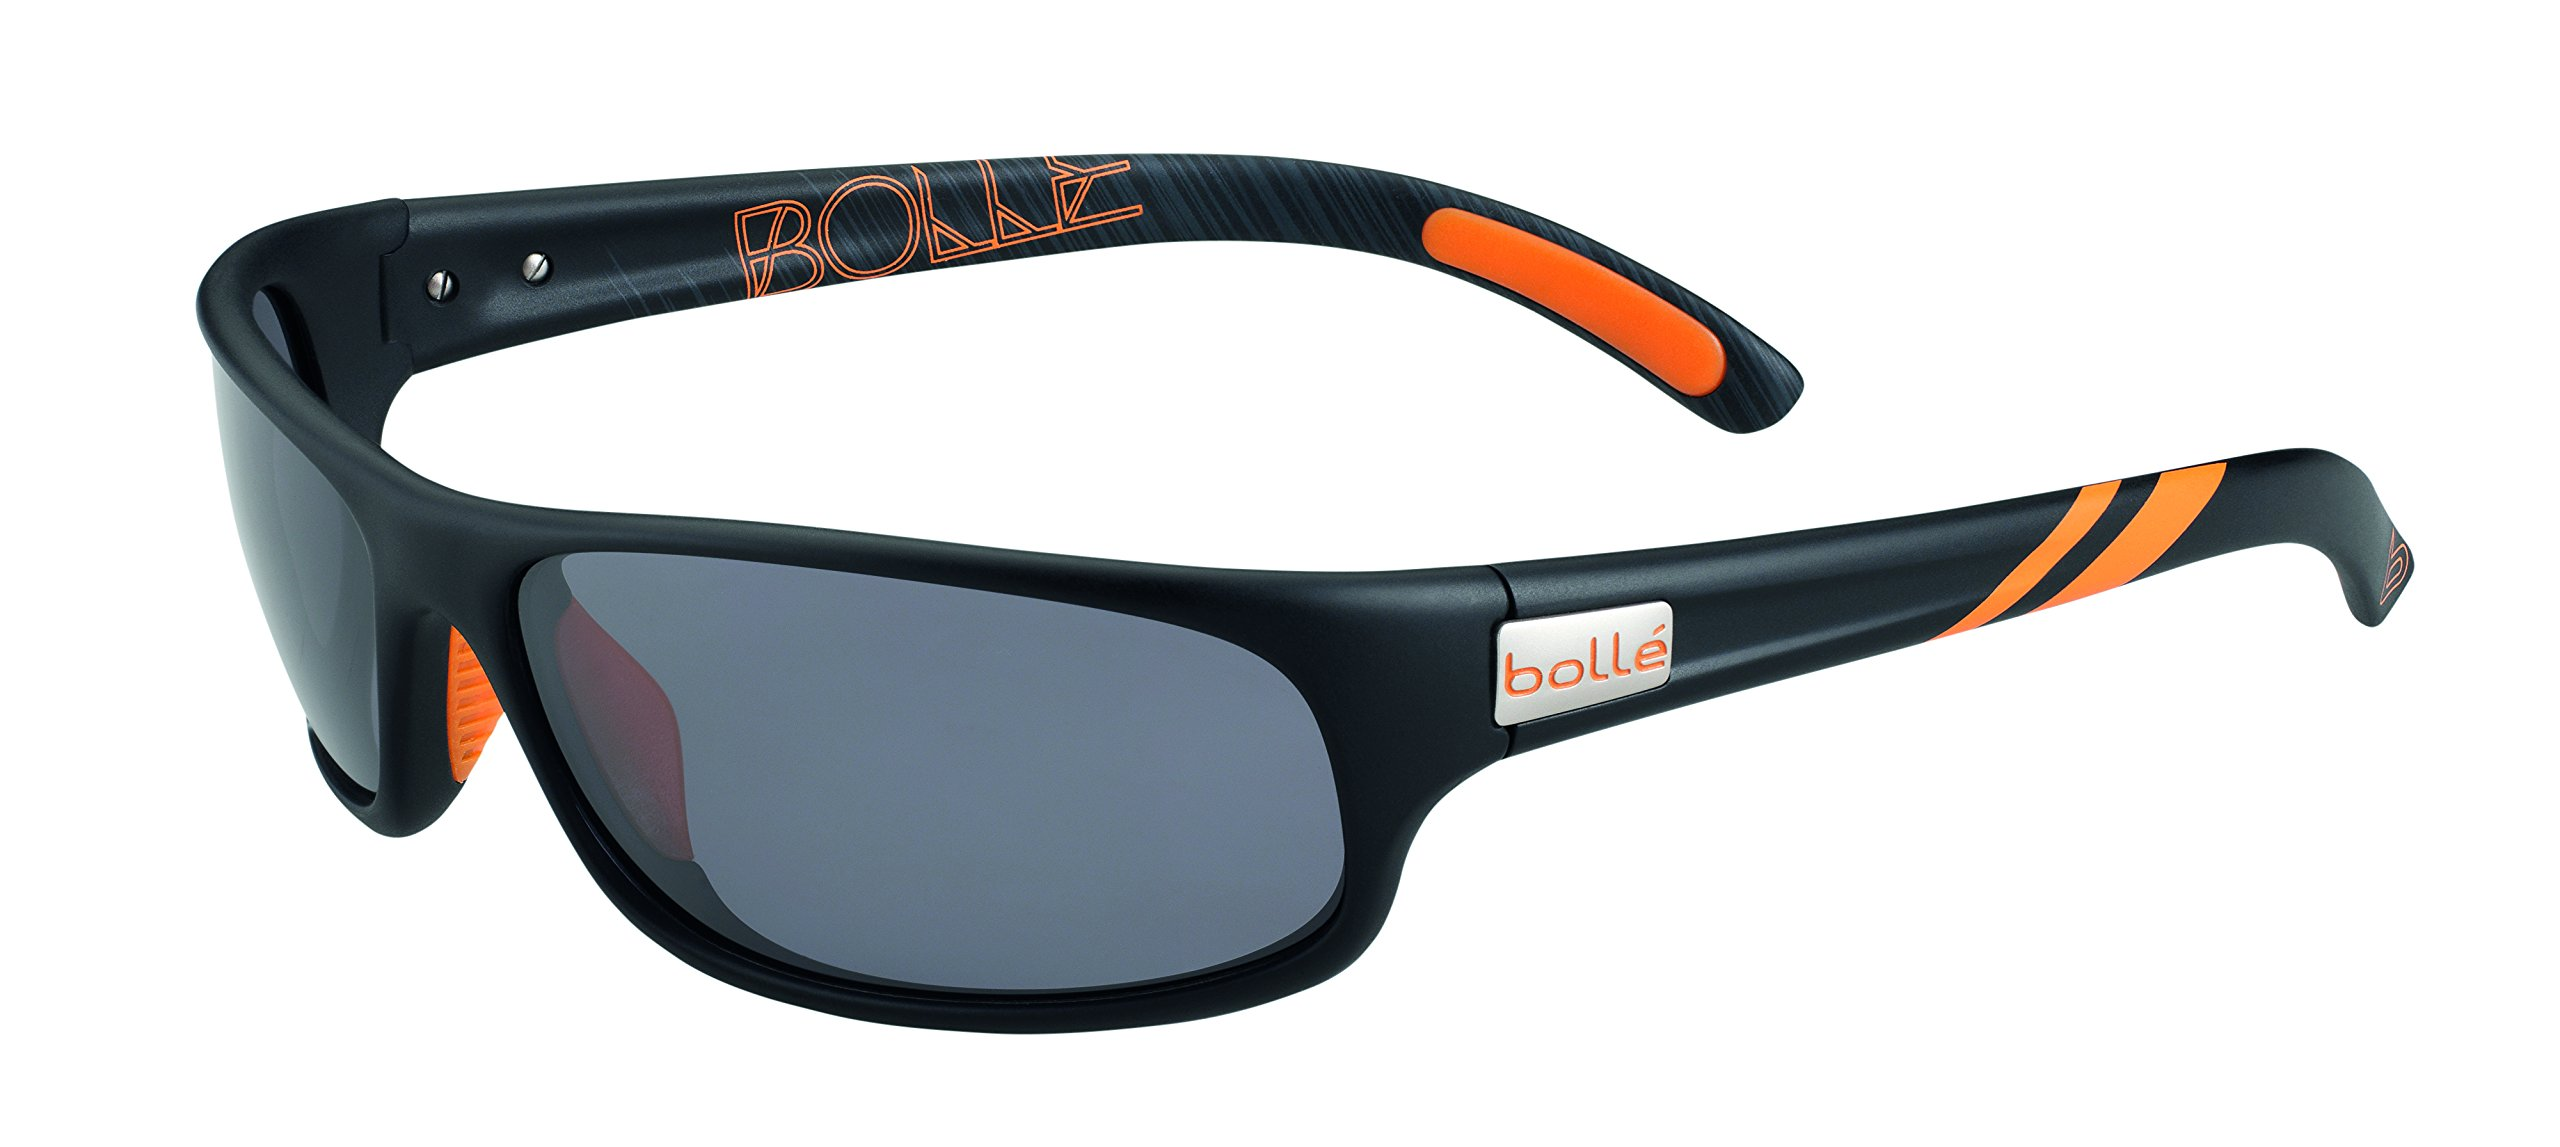 Bolle Anaconda Sunglasses Matt Black/Orange, Smoke by Bolle